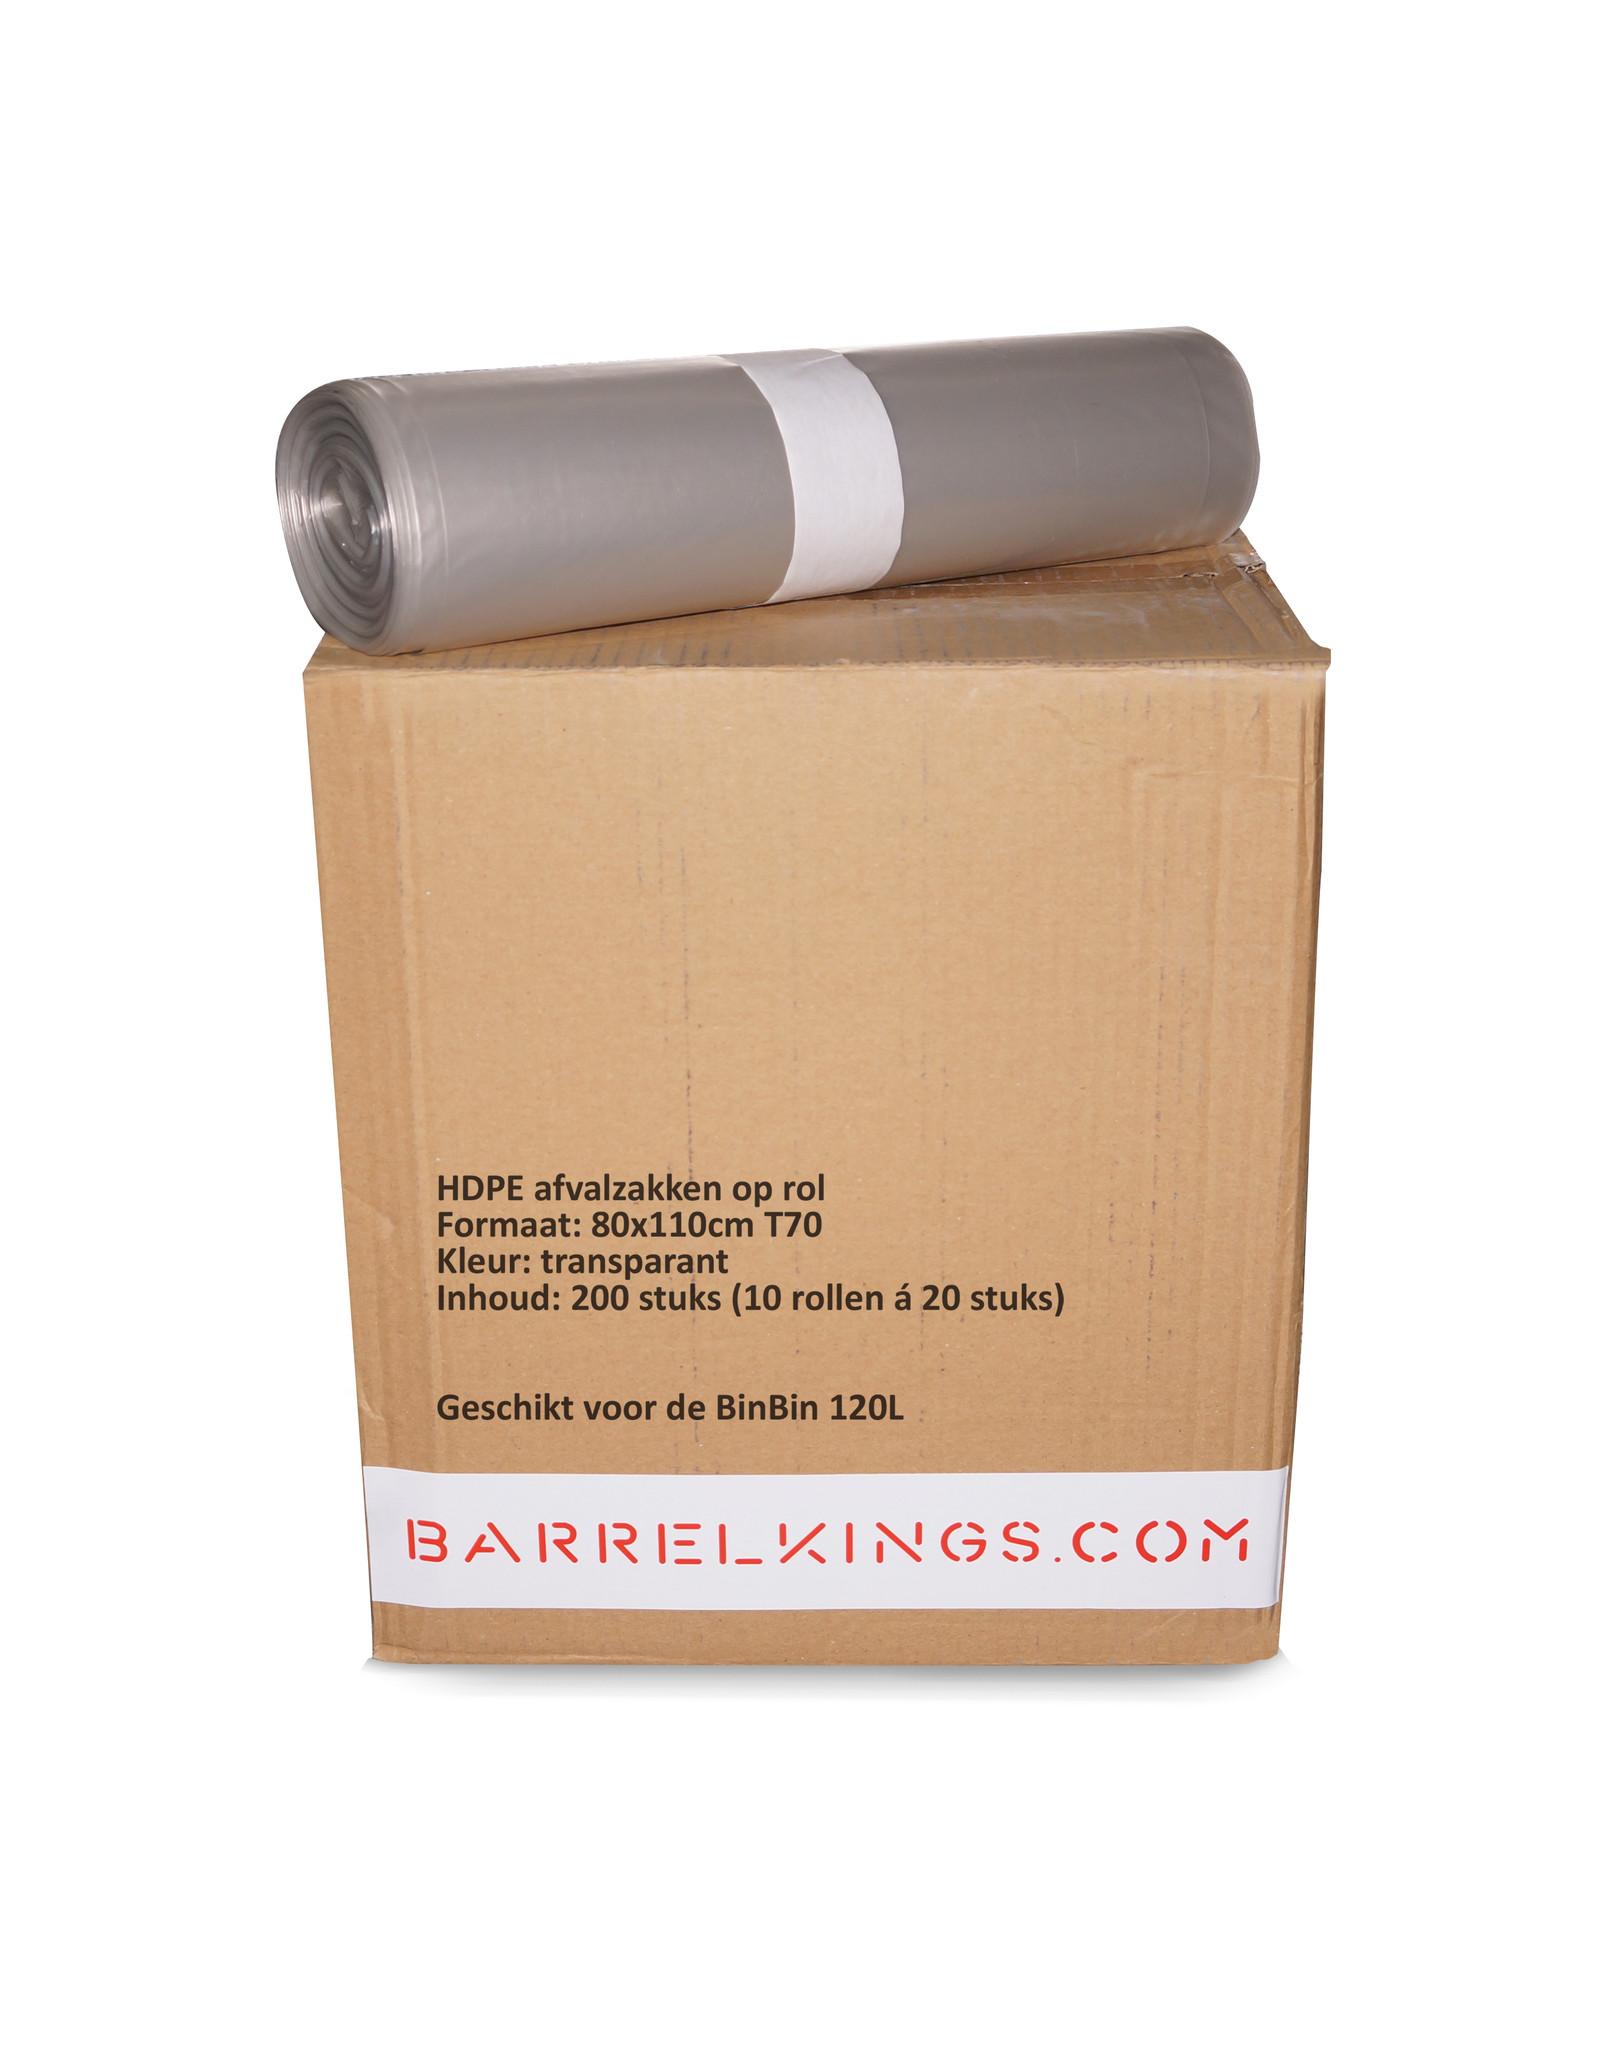 Barrelkings BinBin Flame 120 Liter Mülleimer mit flammhemmendem deckel